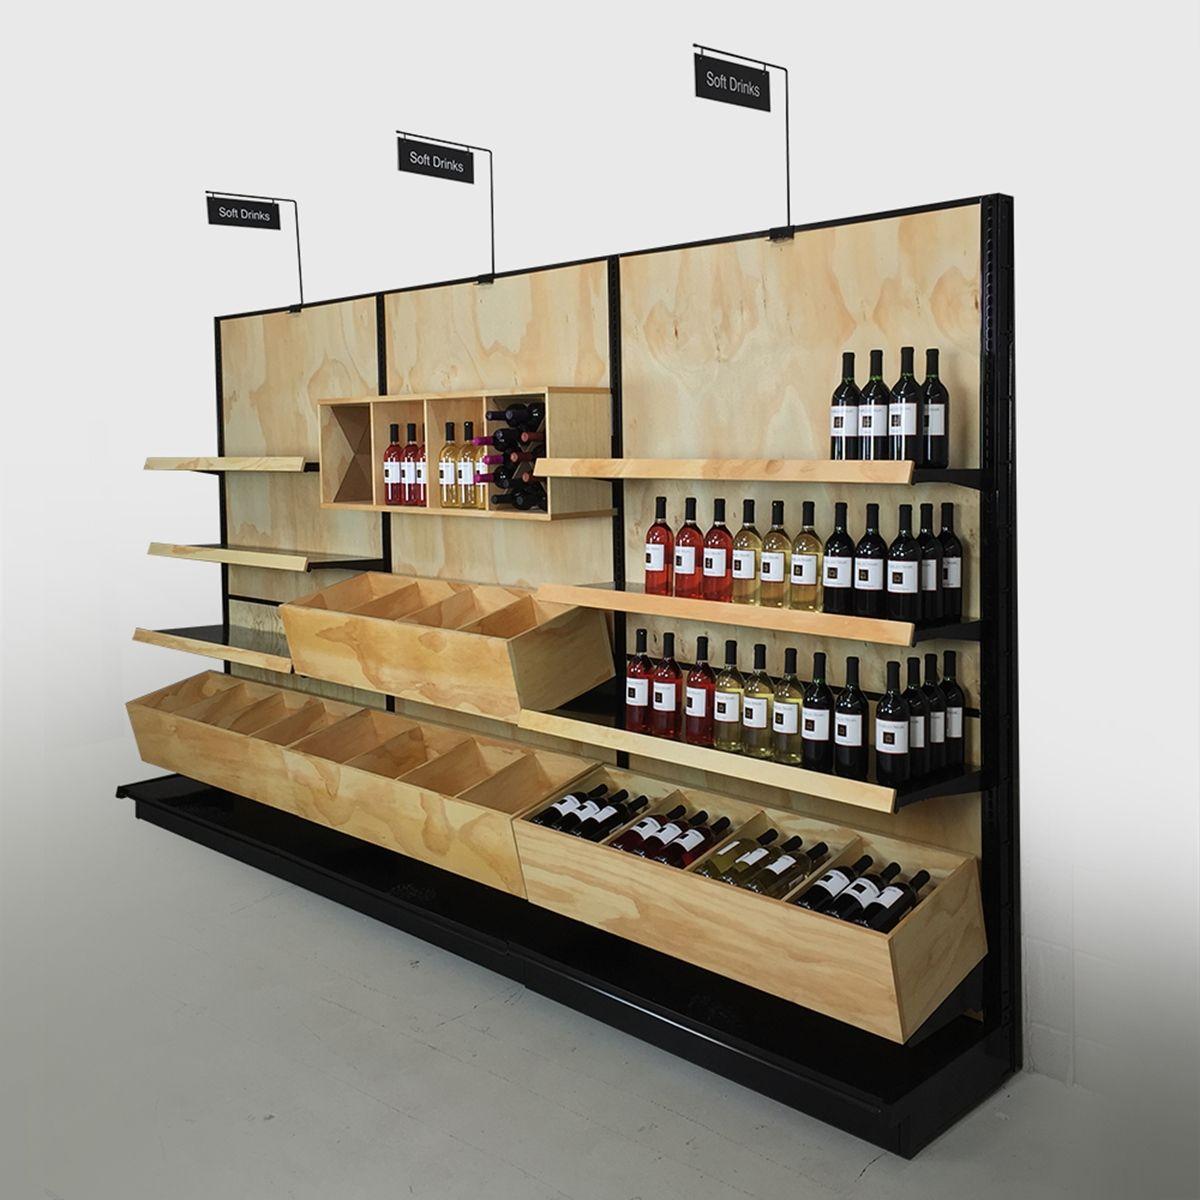 Liquor Store Wine Display Racks